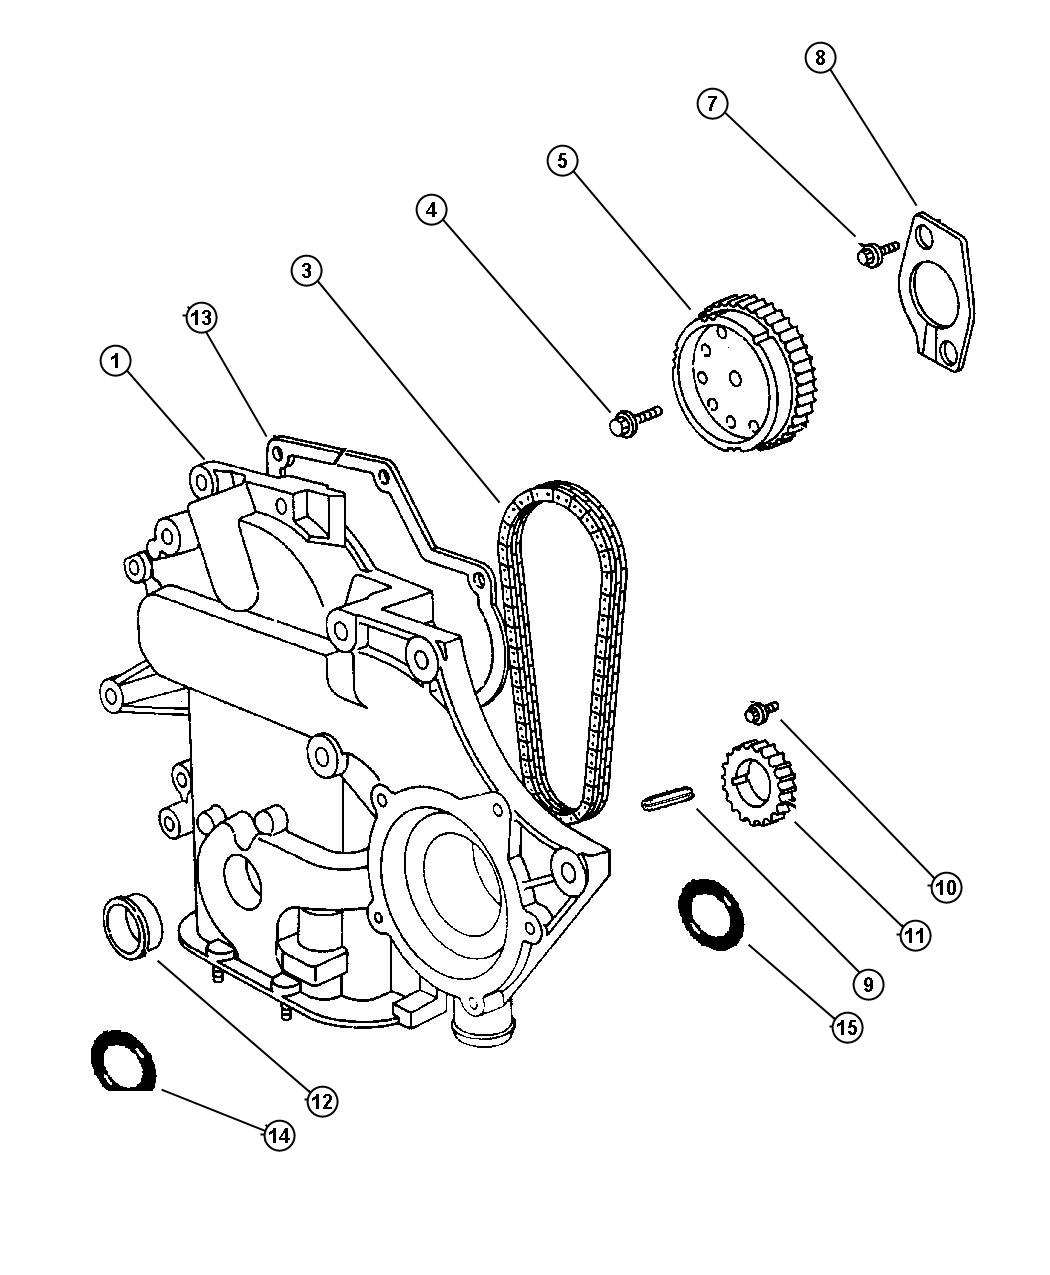 Snap Dodge Caravan Timing Belt Location Get Free Image About Wiring 3 8l Engine Diagram Service Manual 2000 Chain Pdf Durango Water Pump